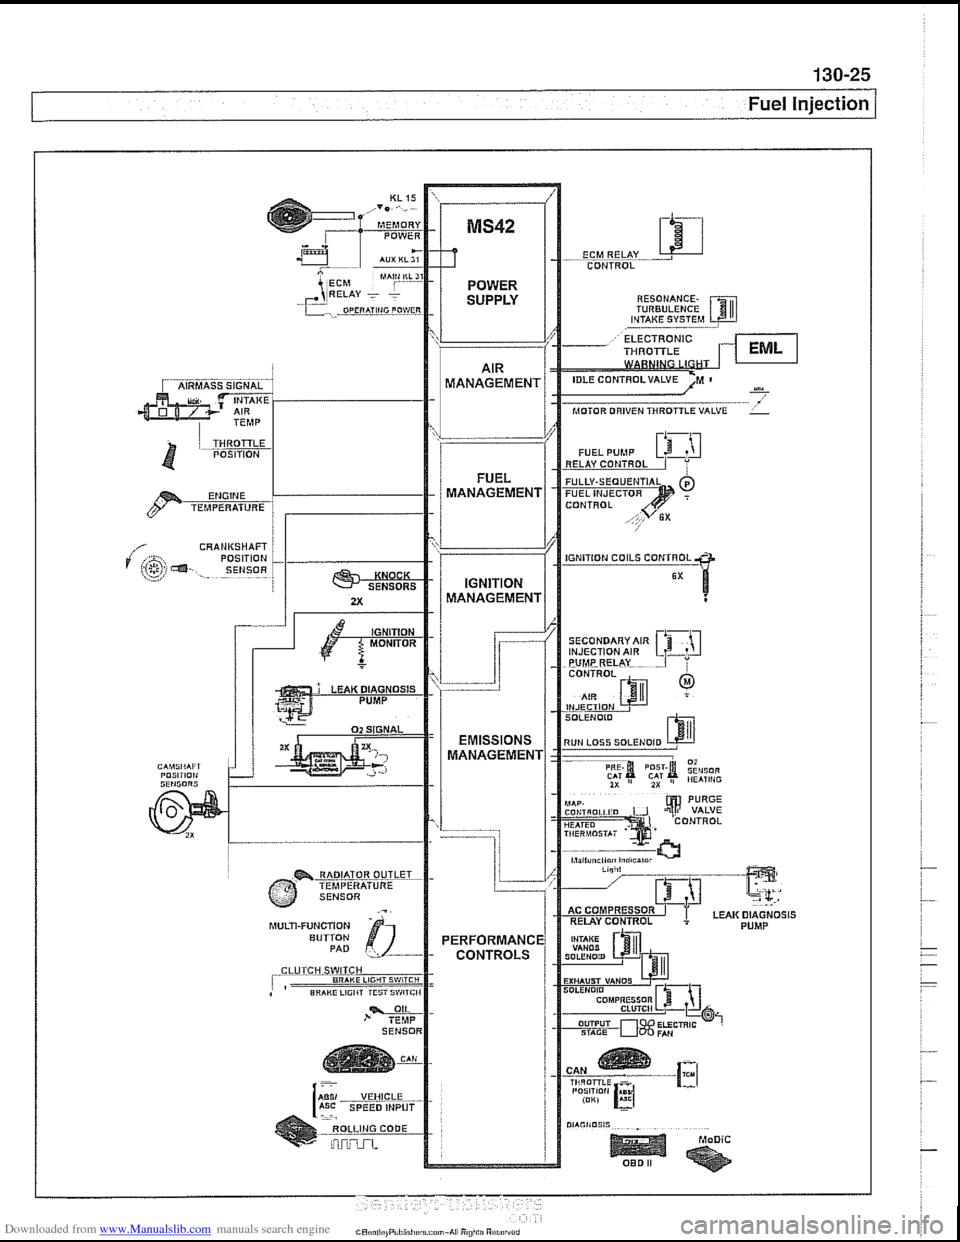 Bmw 540i 1998 E39 Workshop Manual Fuse Relay Box Transmissions